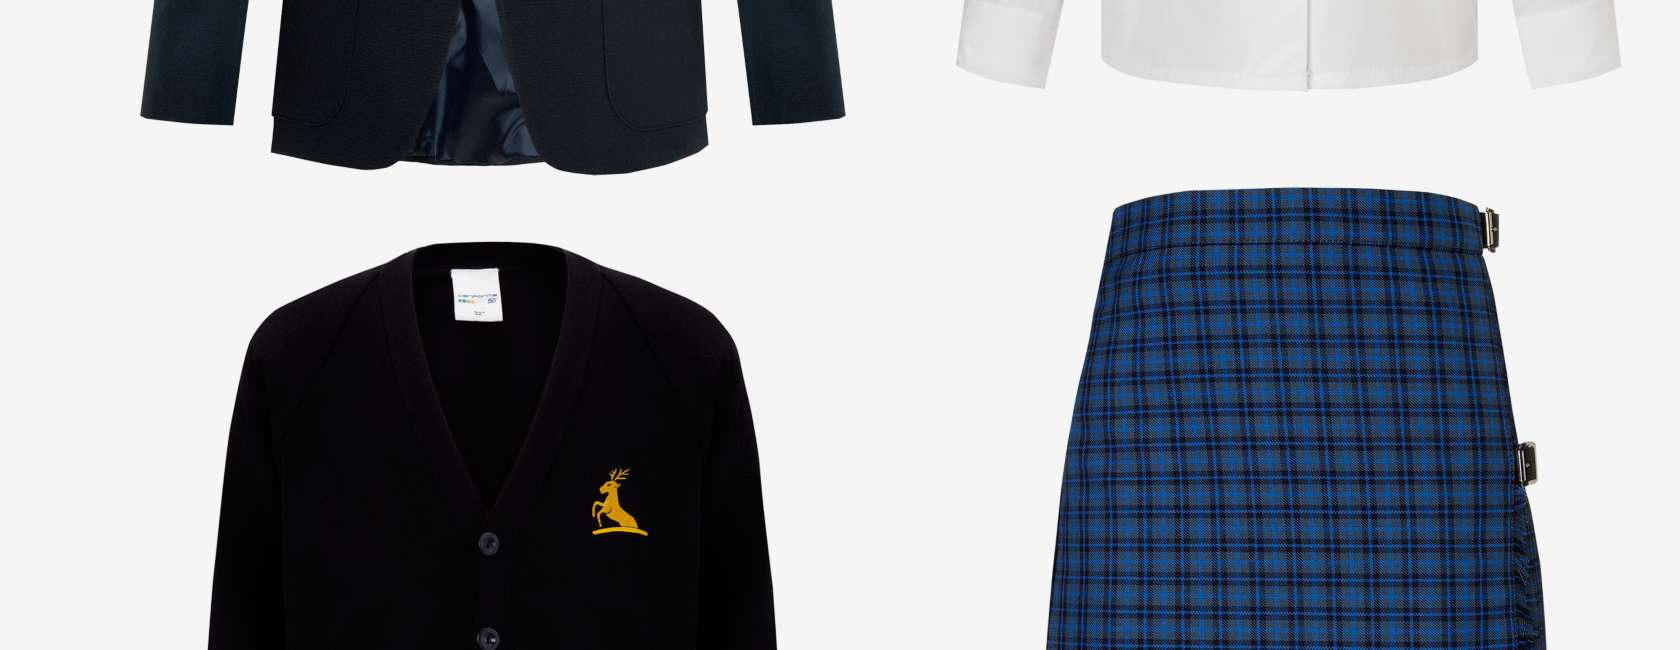 89b9258d0 Colfe's School Girls' Senior Uniform at John Lewis & Partners